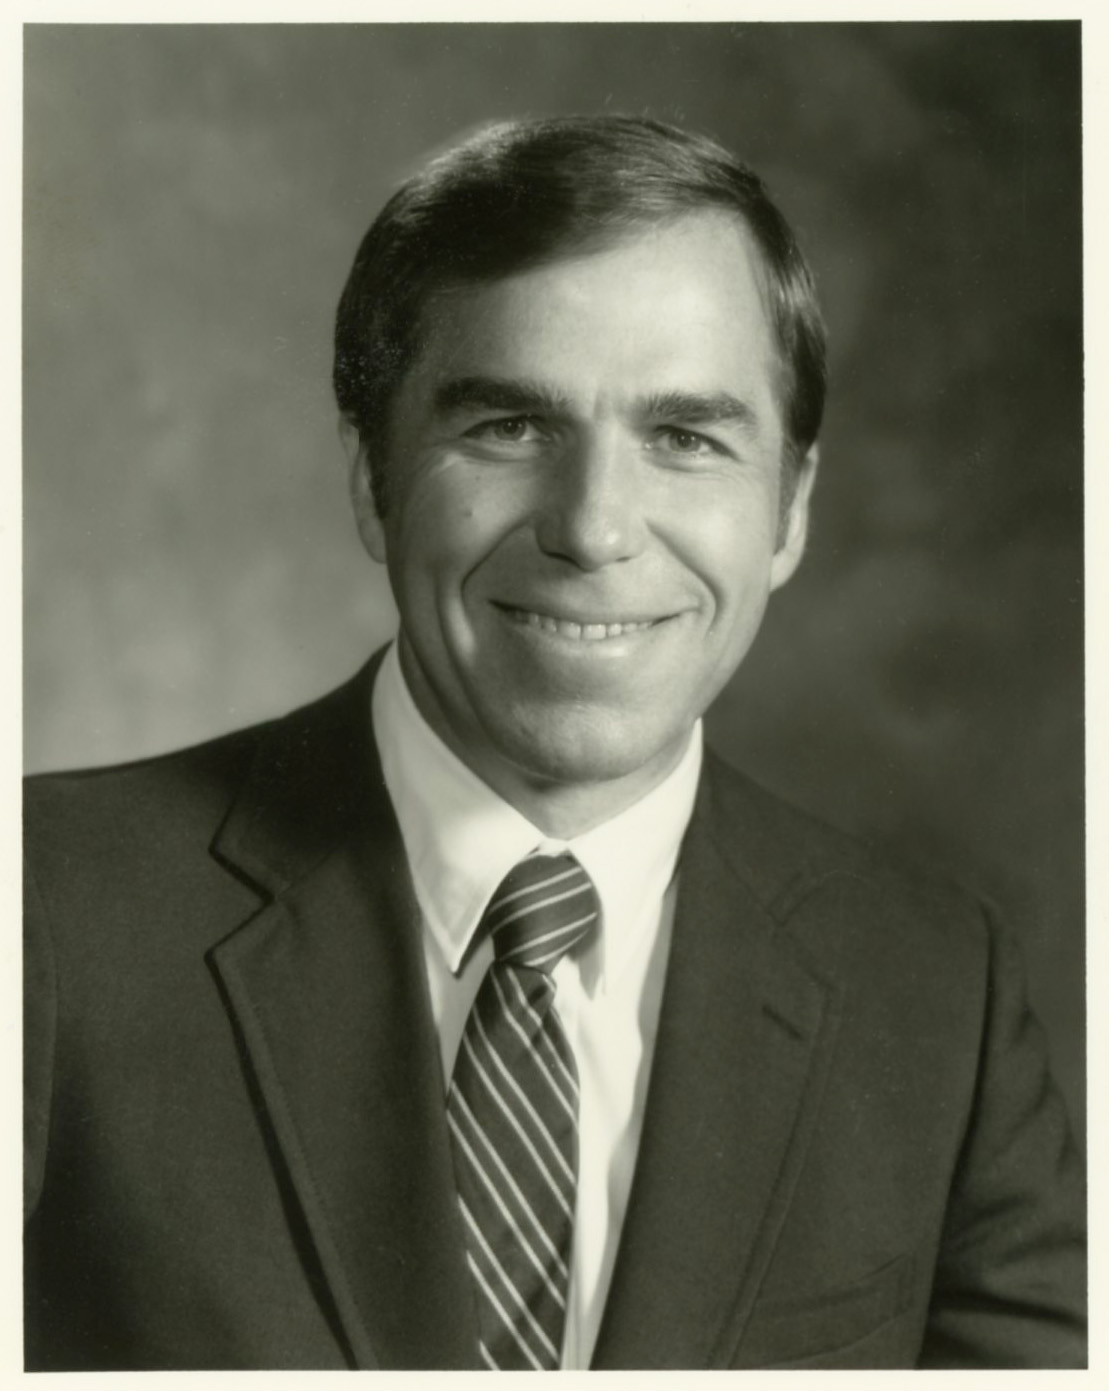 Roger C. Bone, MD, MACP, MFCP, FCCM